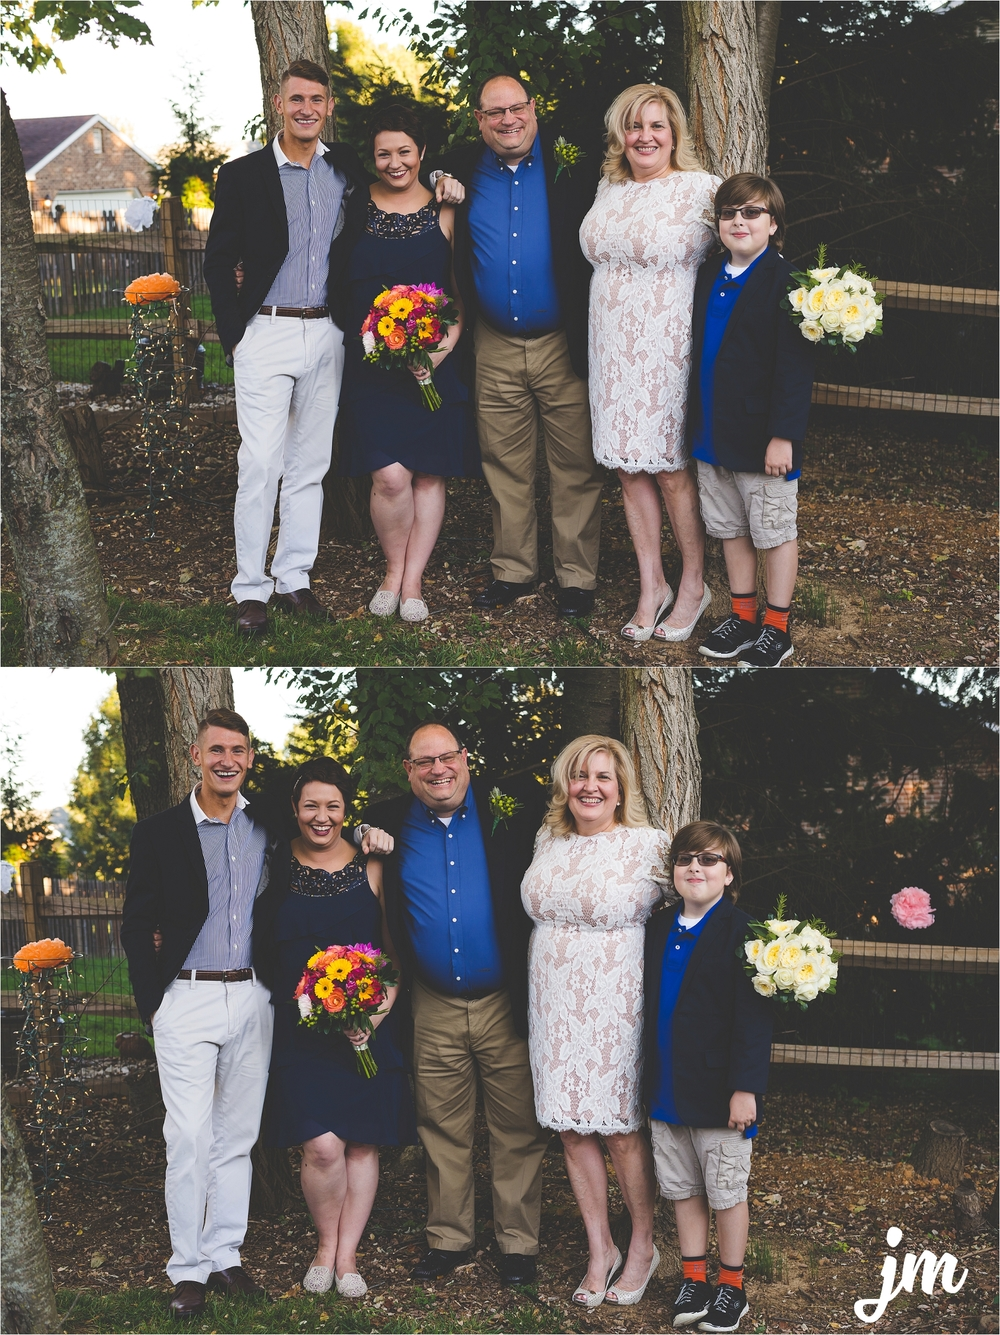 backyard-wedding-pacific-northwest-photographer-jannicka-mayte_0023.jpg